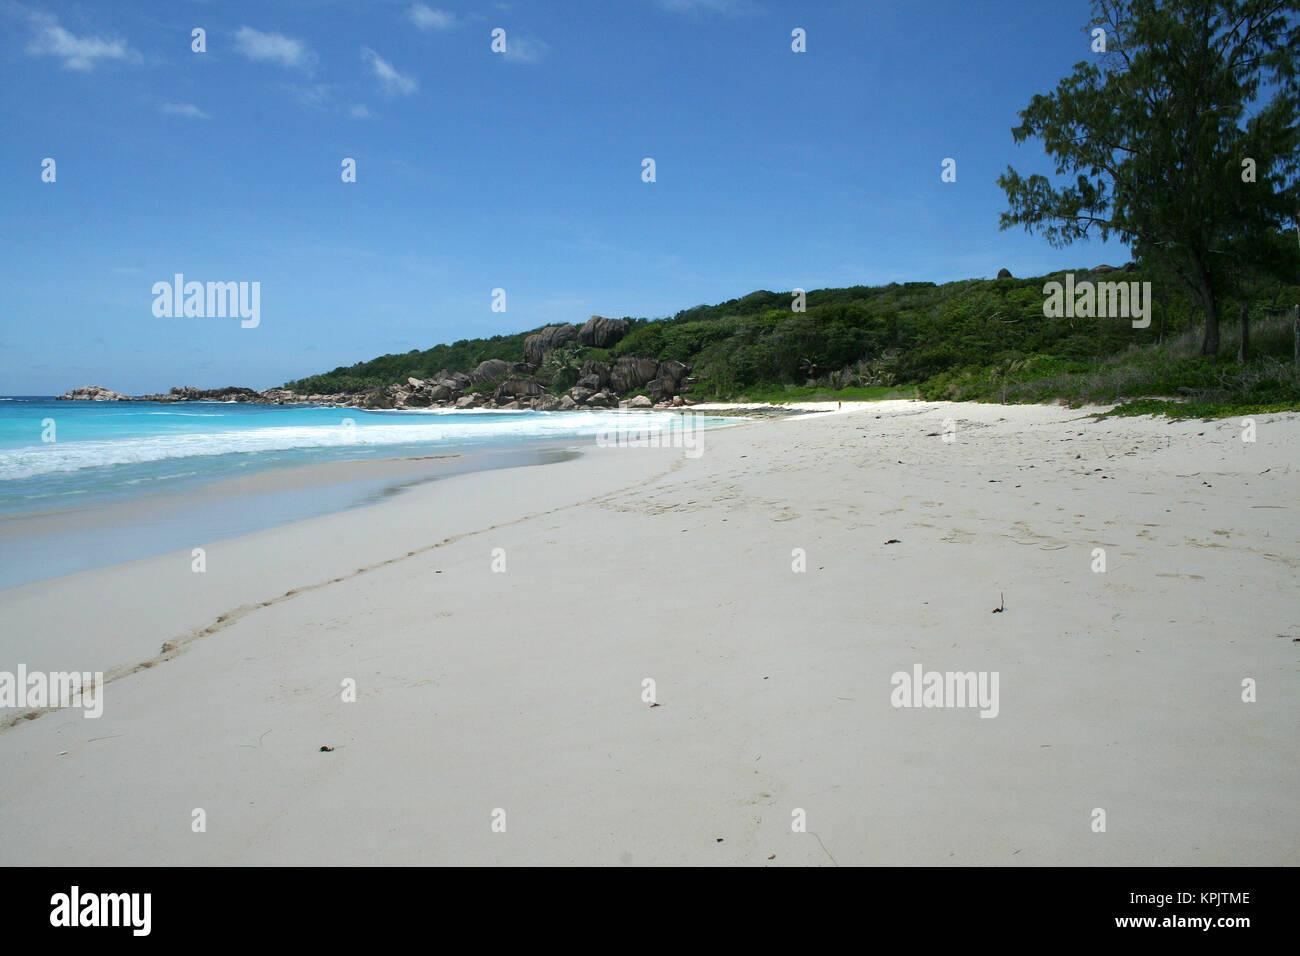 Rocky beach, La Digue Island, Seychelles. Stock Photo